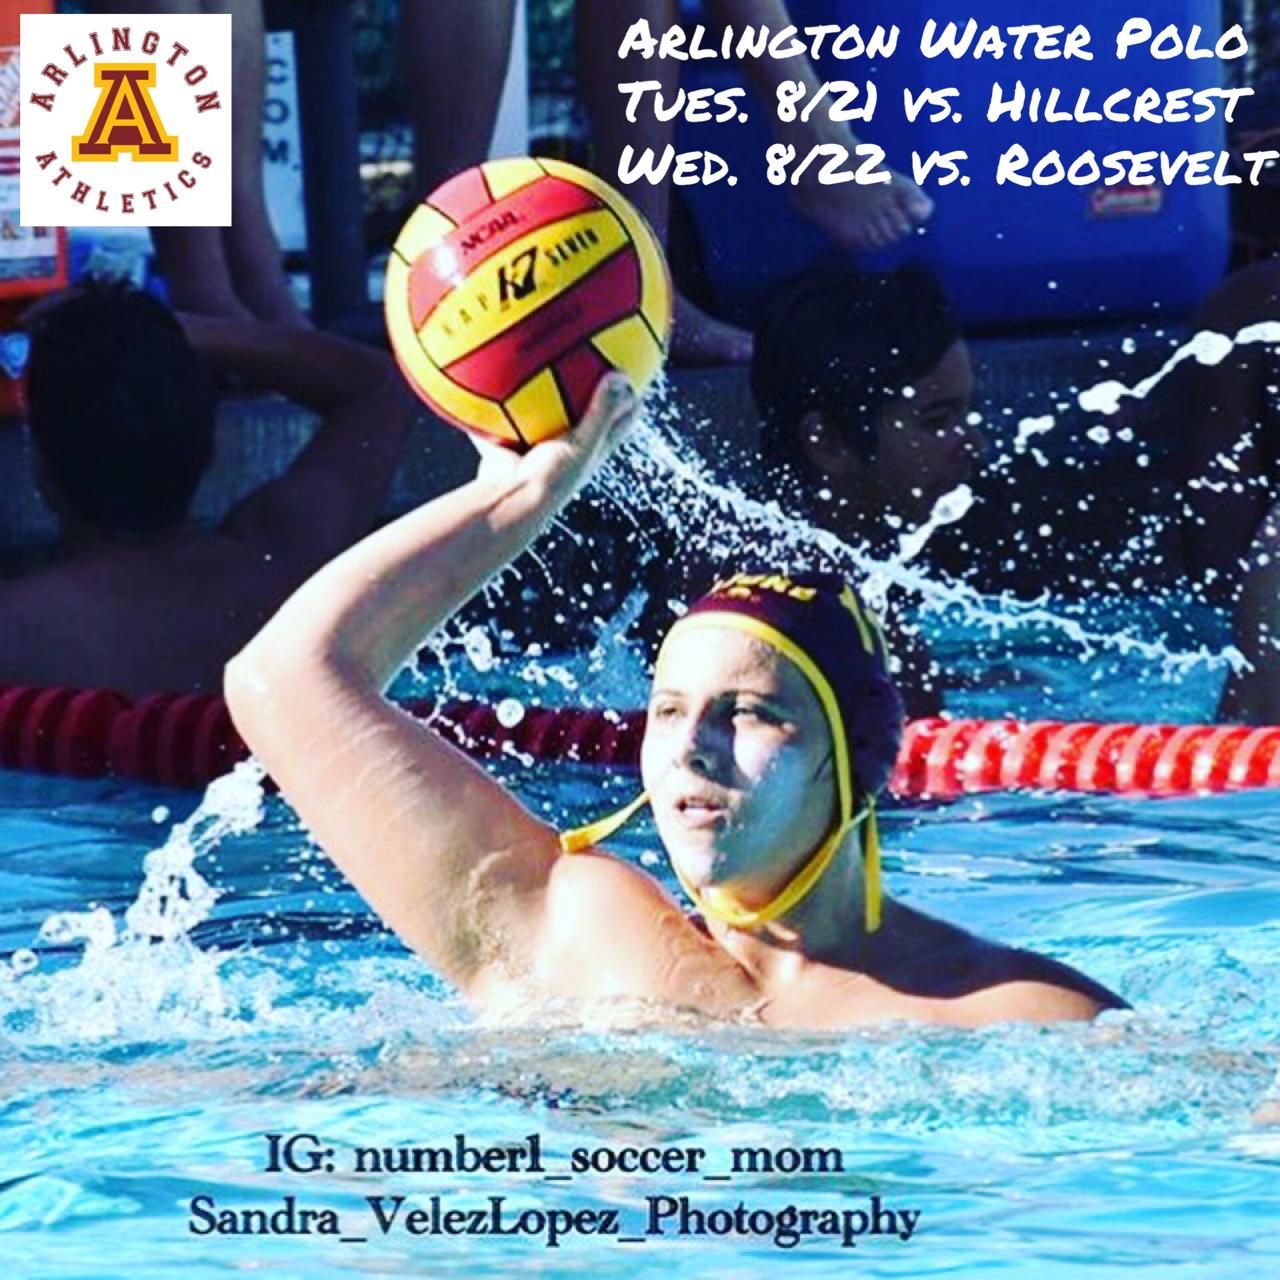 Tuesday, 8/21: Arlington Boys' Water Polo hosts Hillcrest H.S. – 3:15 p.m.